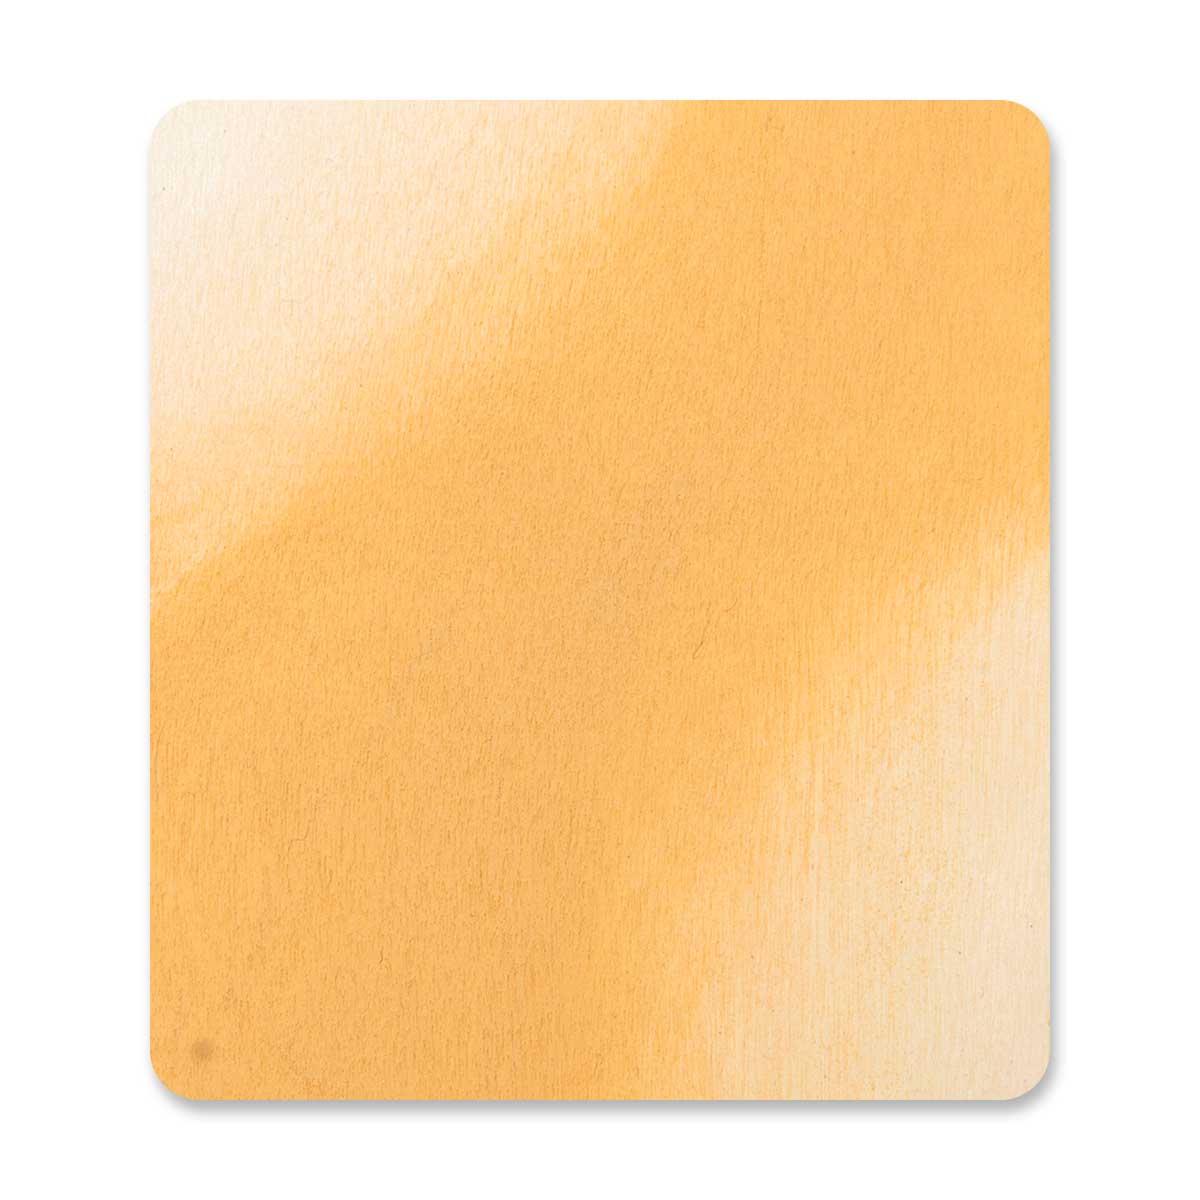 FolkArt ® Watercolor Acrylic Paint™ - Ochre, 2 oz.